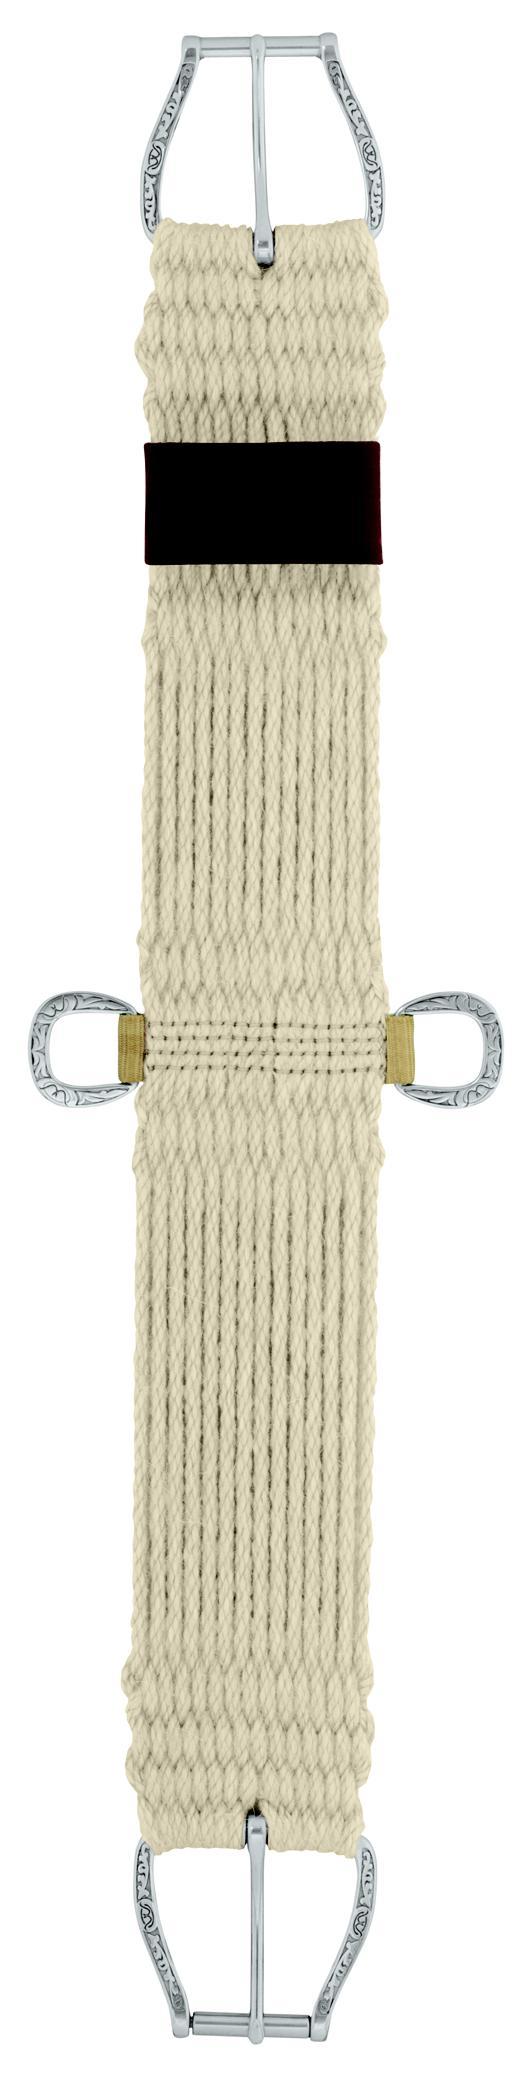 Weaver Leather Straight Jw 100% Mohair Cinch